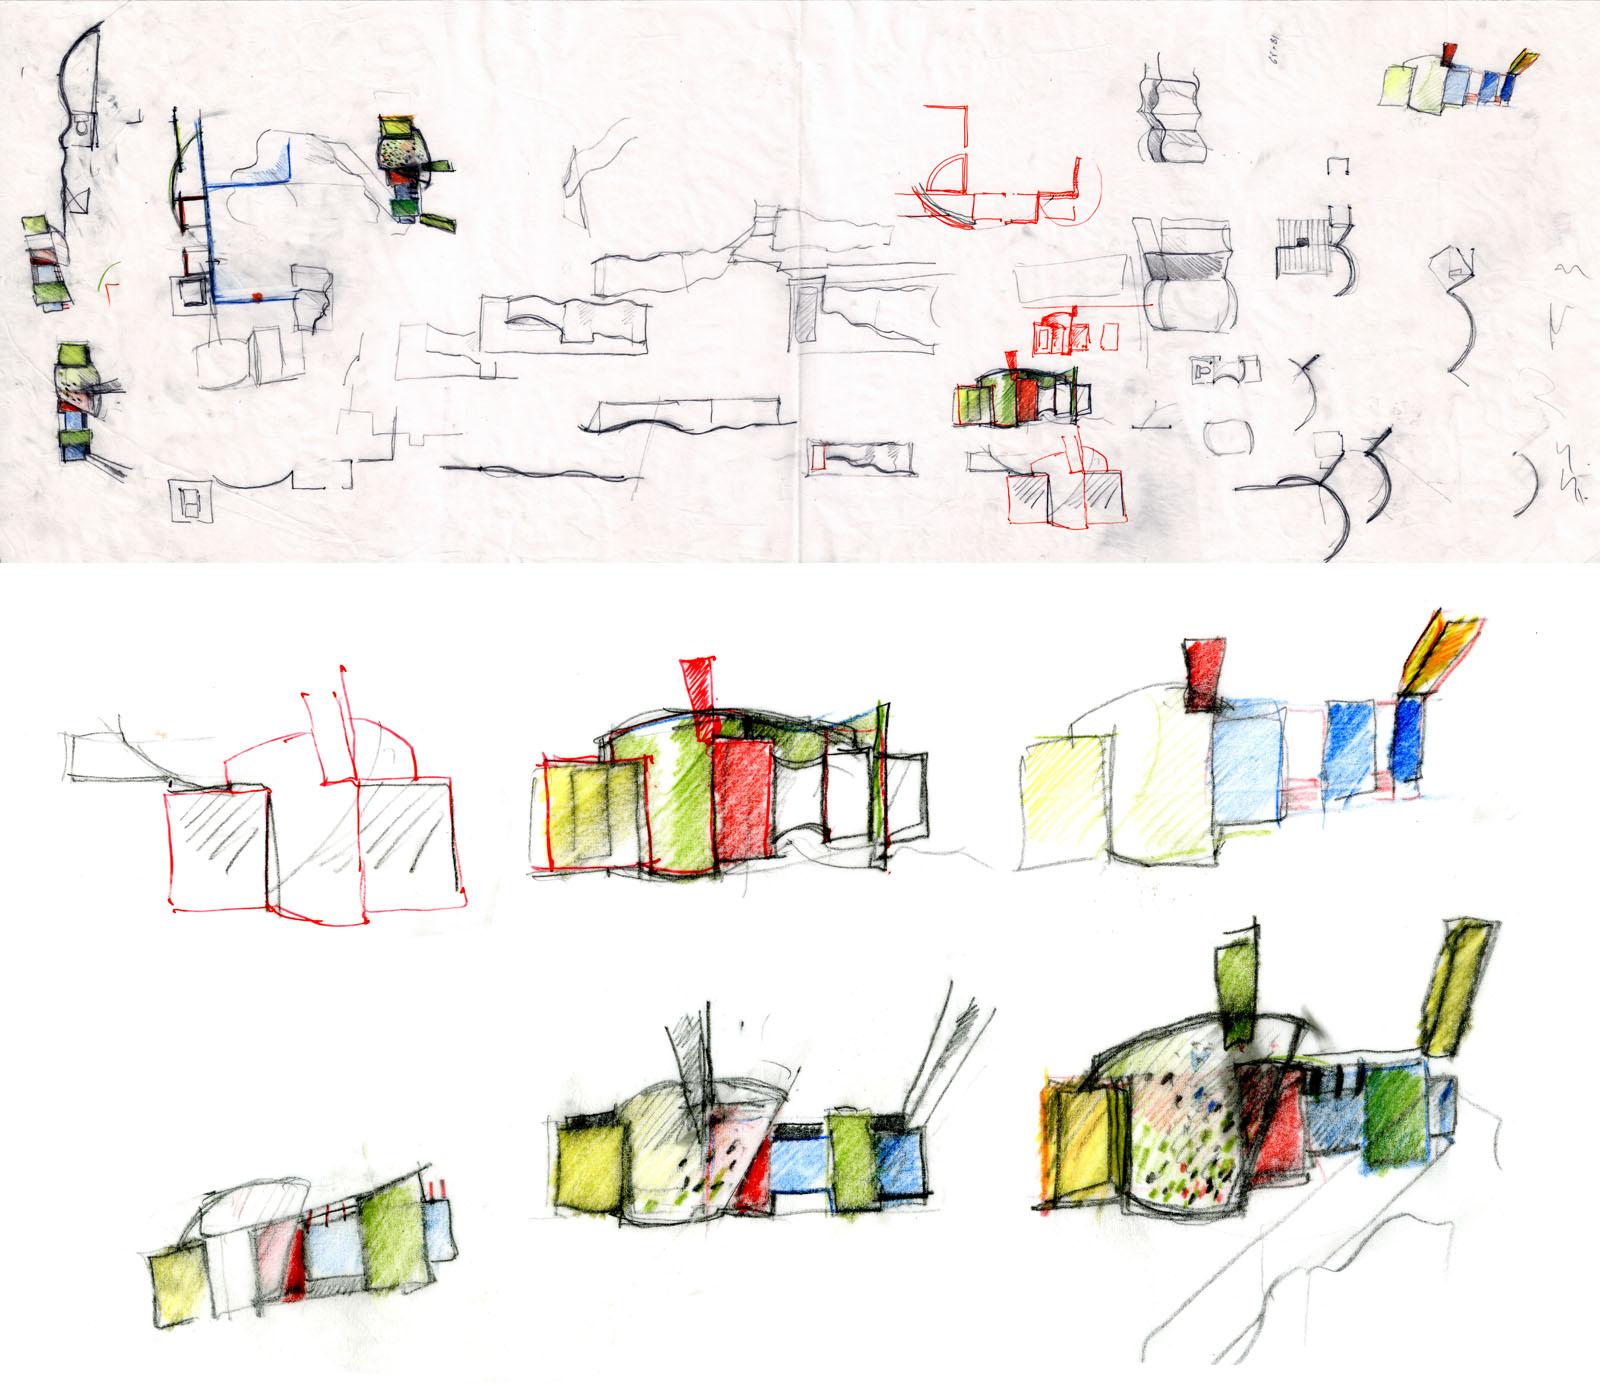 danielvillalobos-architecturexxithcentury-spanisharchitecture-1